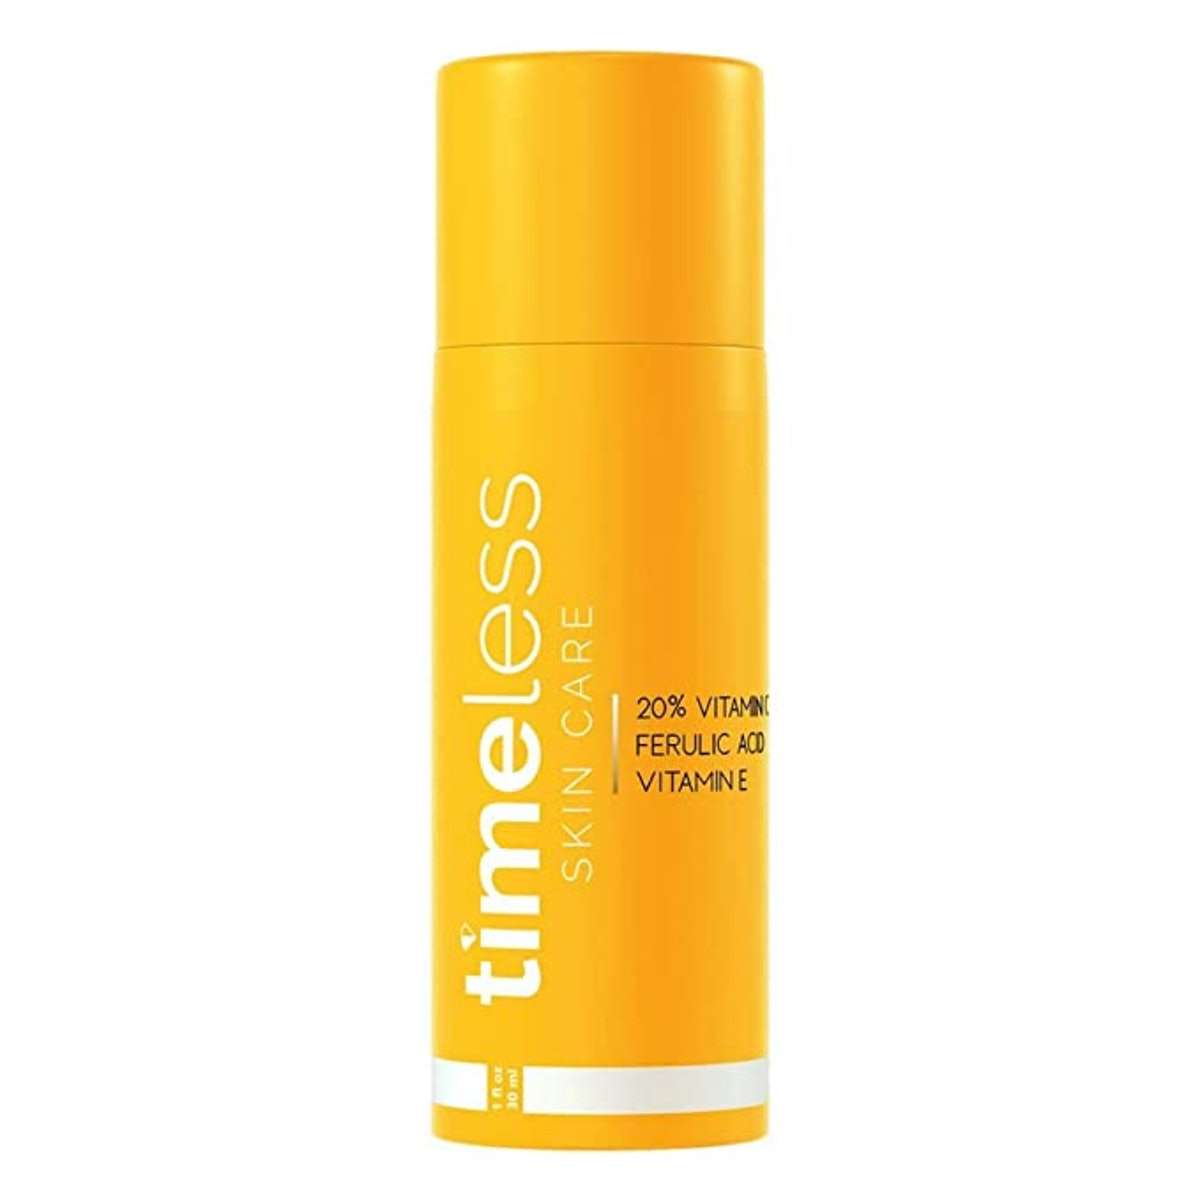 Timeless Skin Care Ferulic Acid Serum